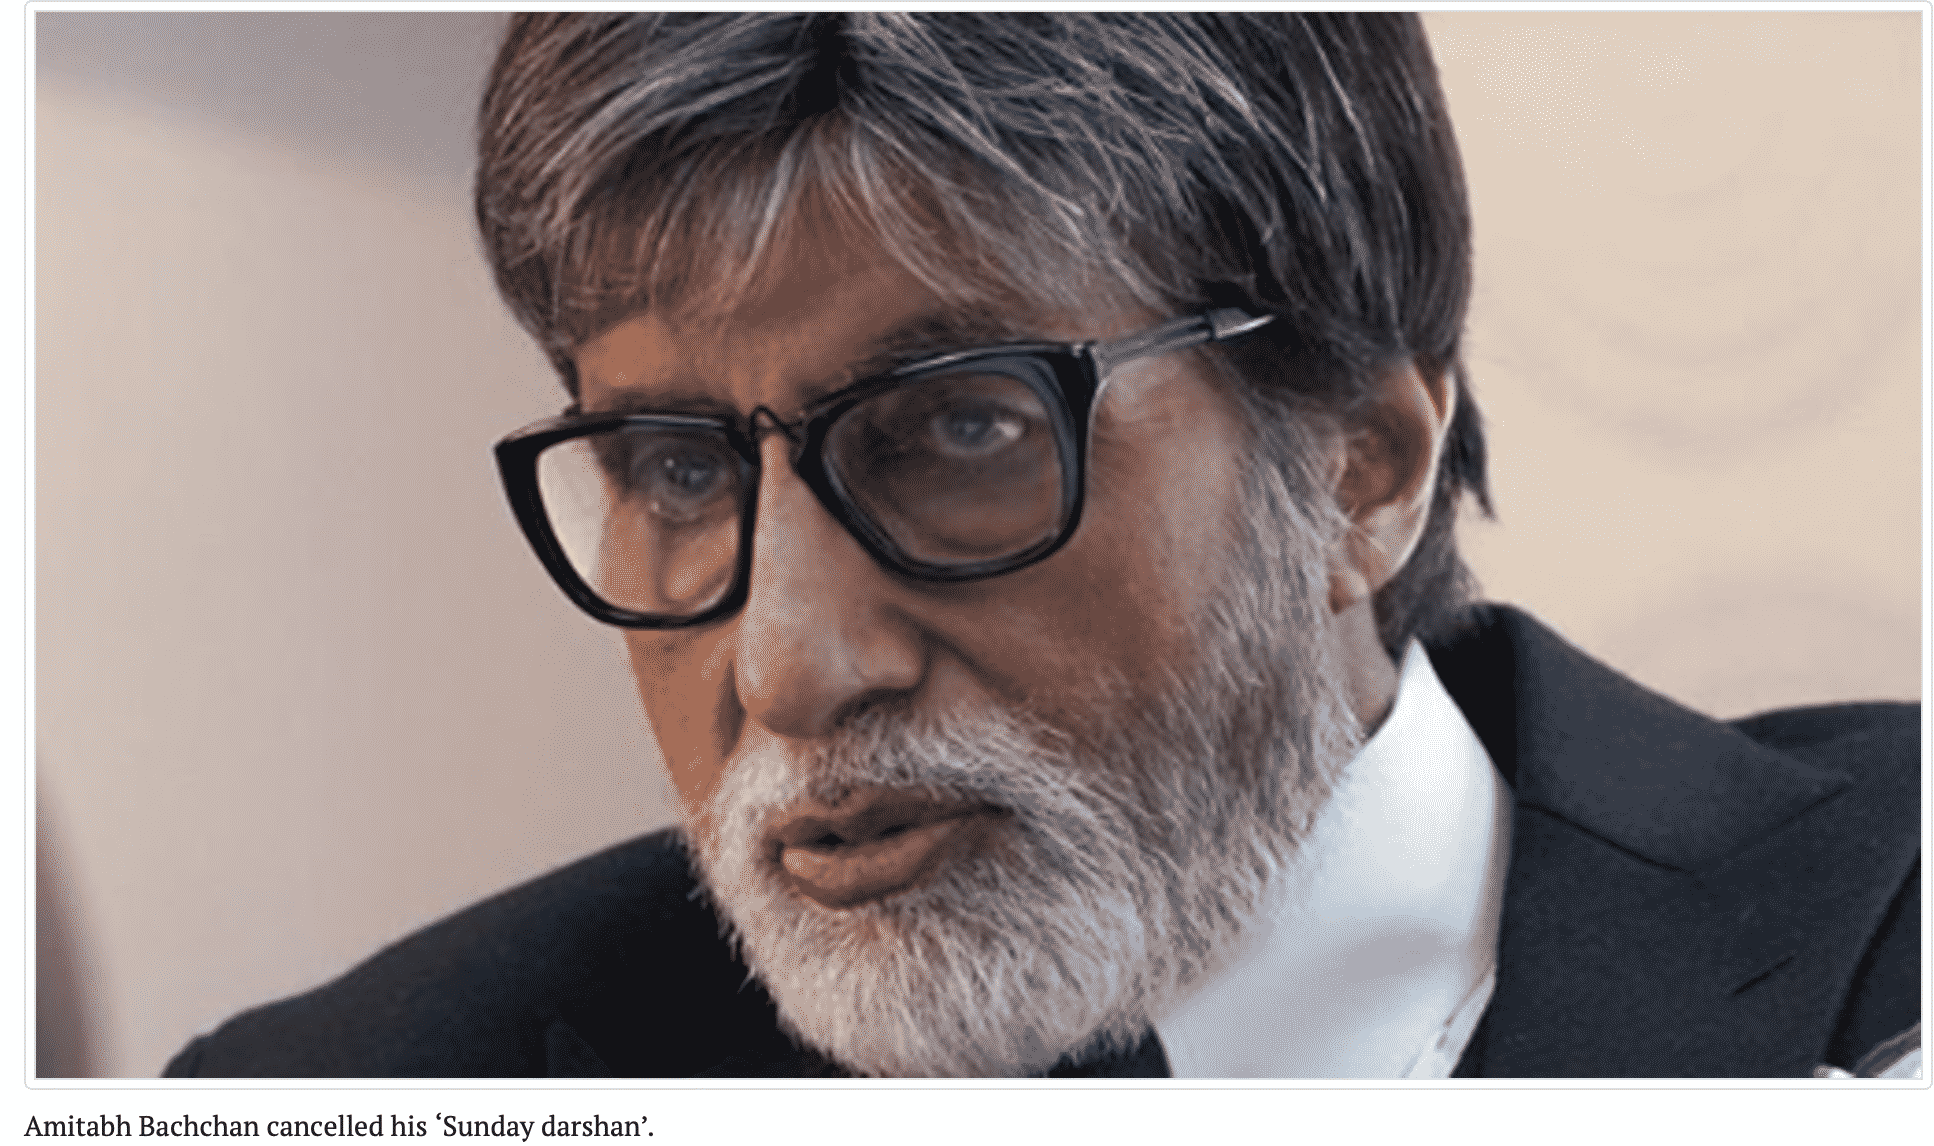 Amitabh Bachchan cancelled his 'Sunday darshan'